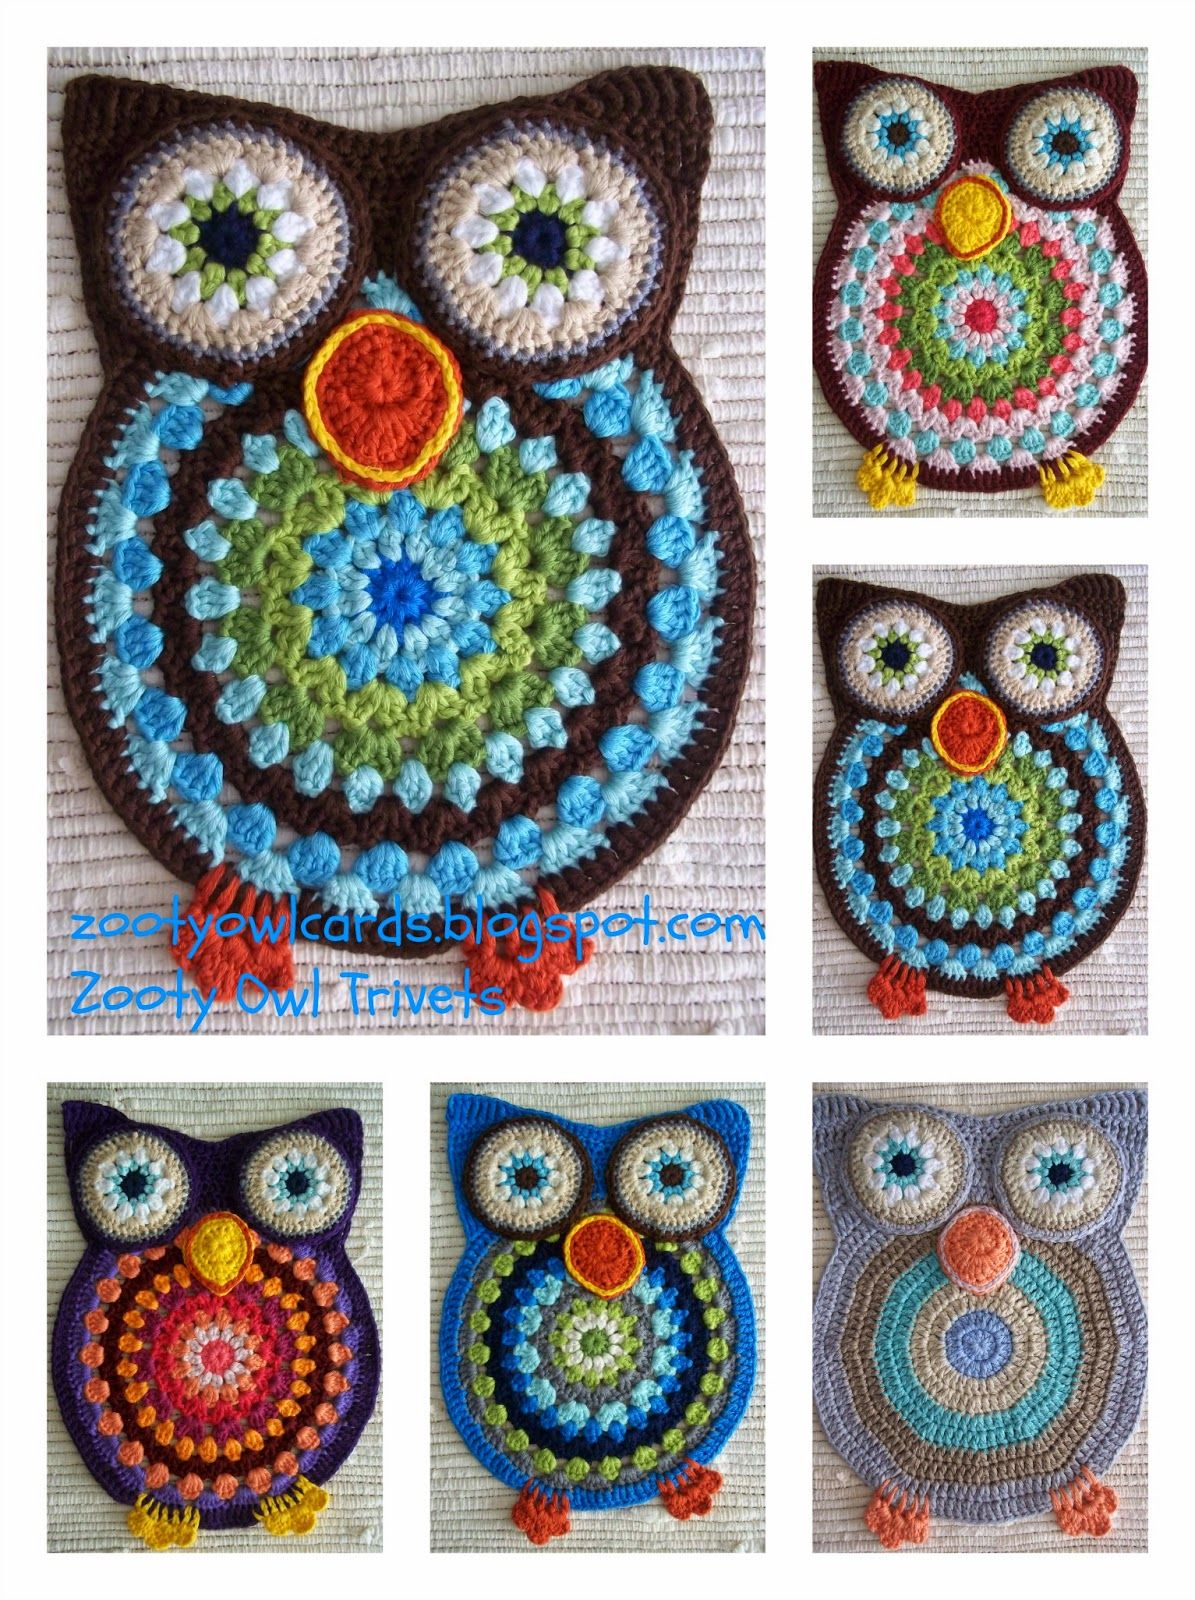 13 Cute and Lovely Crochet Rug with Patterns | Eule, Häkeln und Häckeln